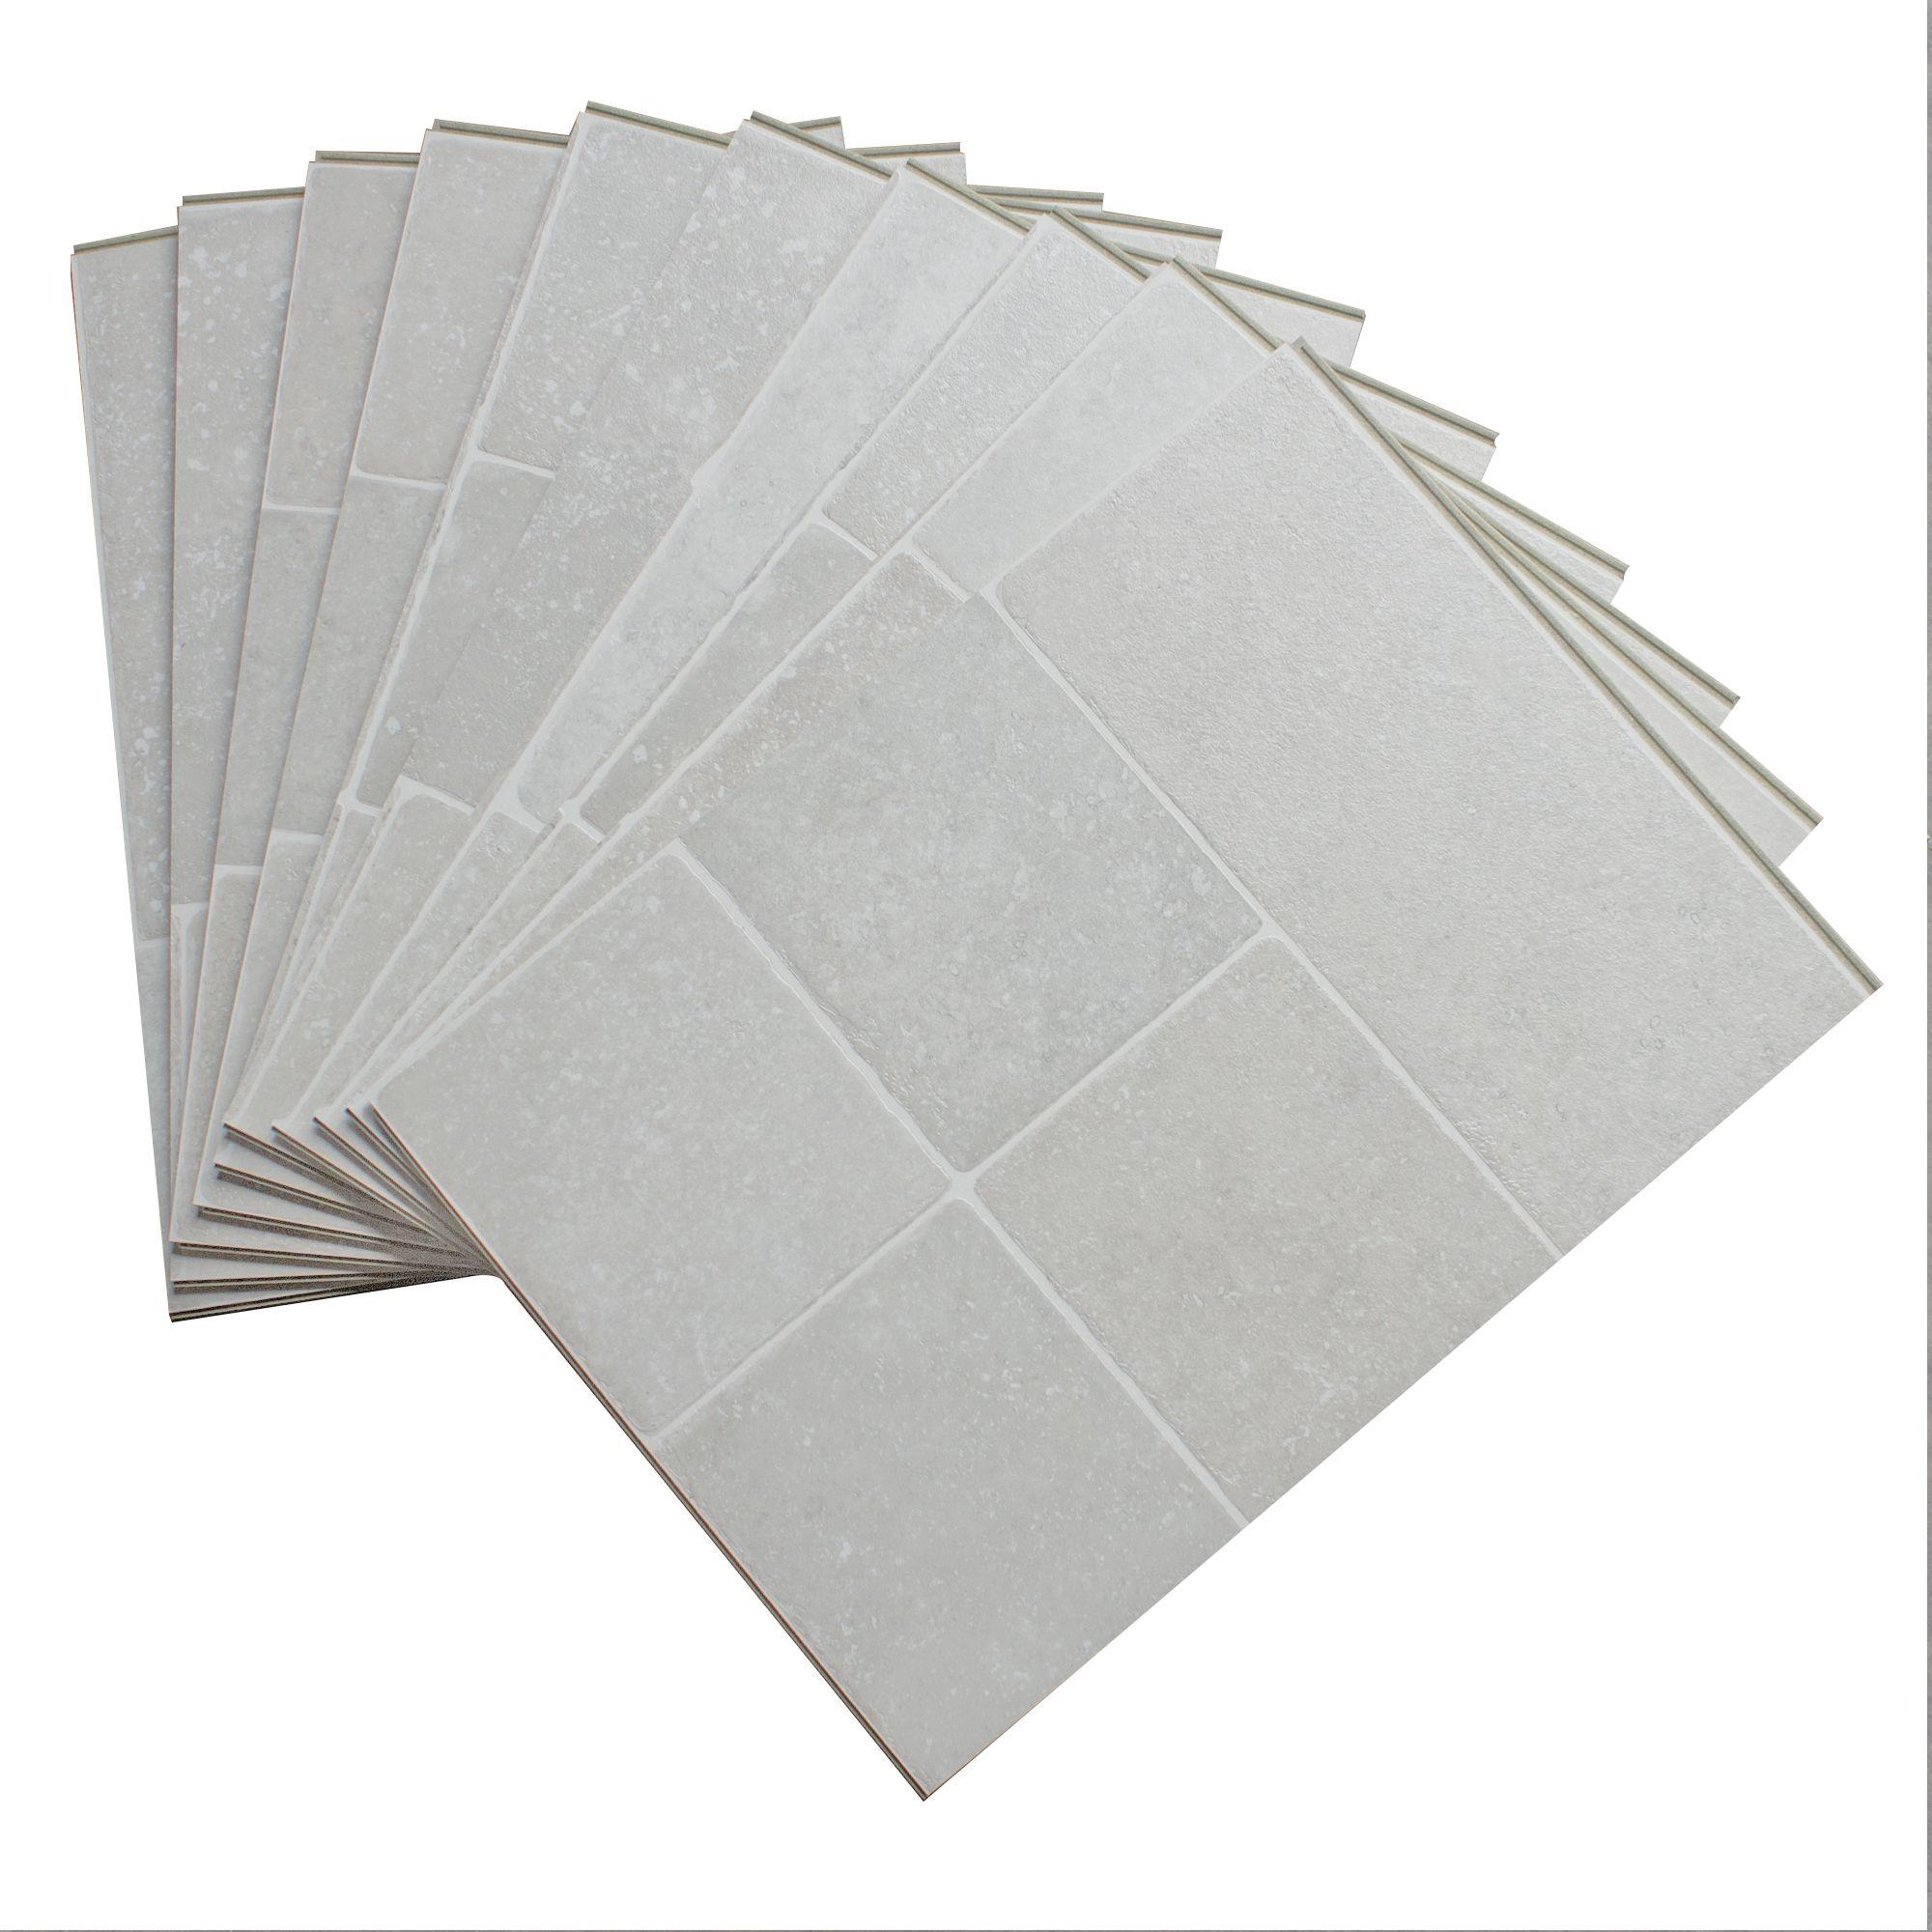 Image Result For Lamanite Flooring